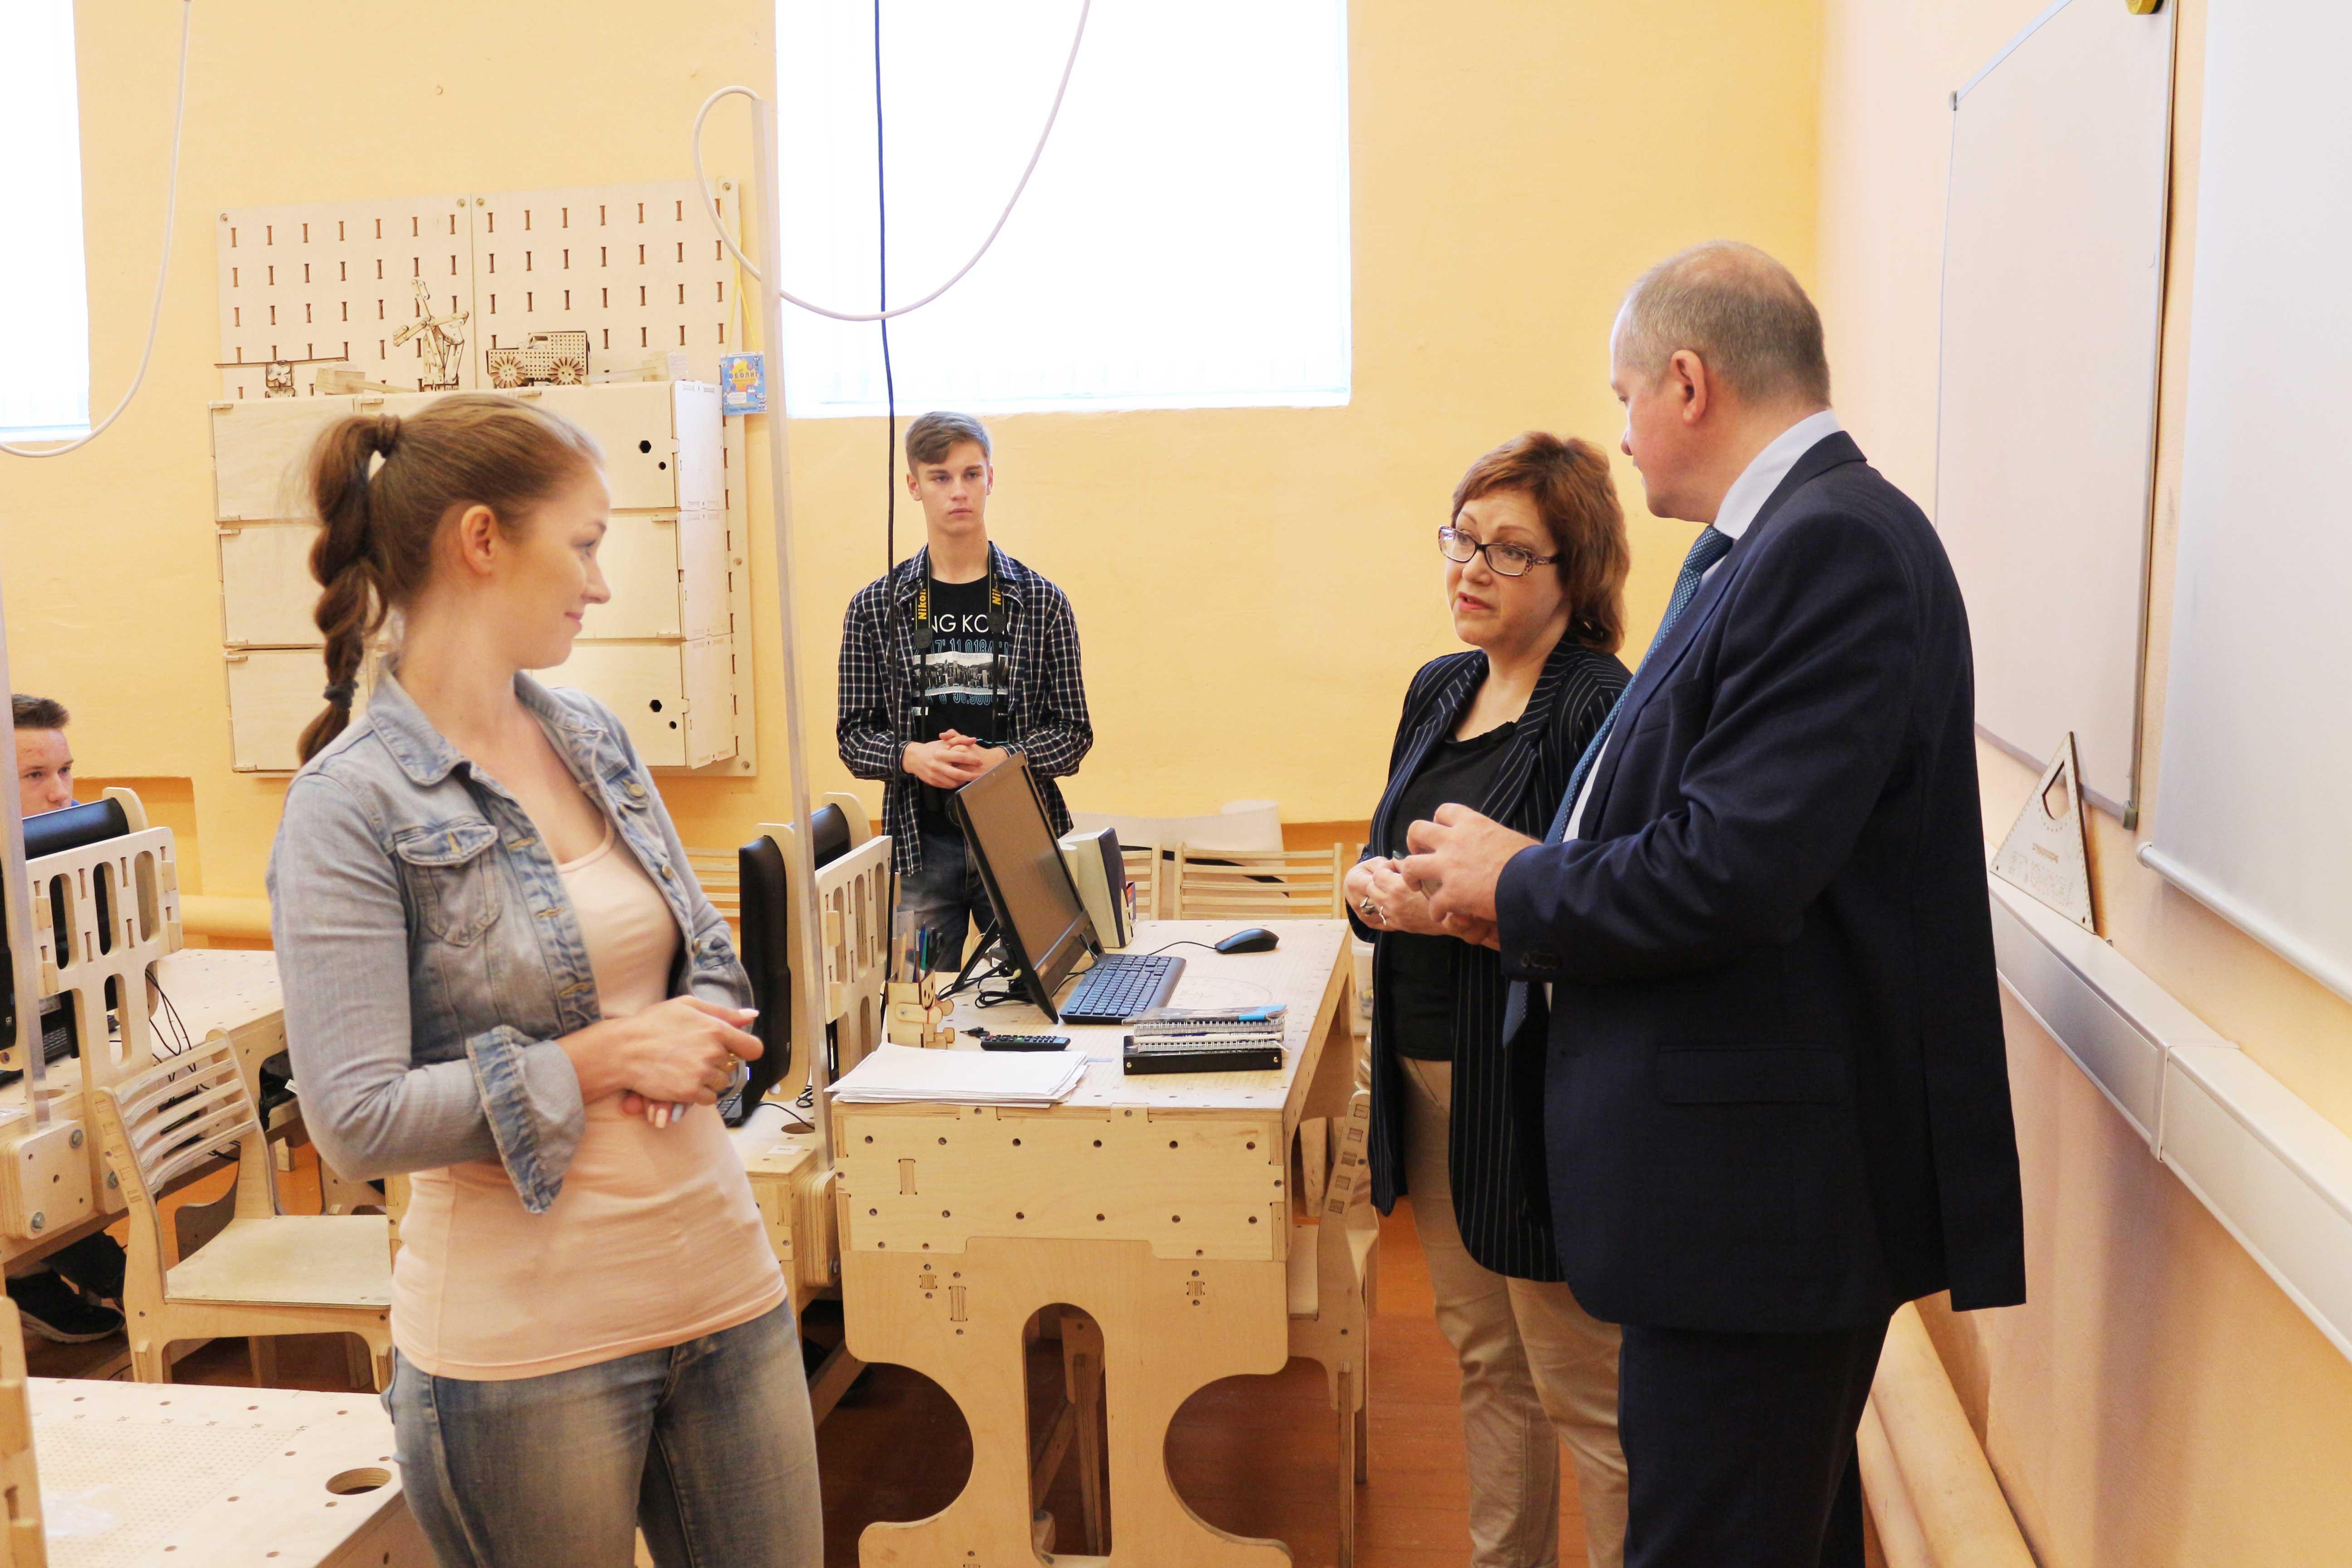 Министр образования посетил Технолаб